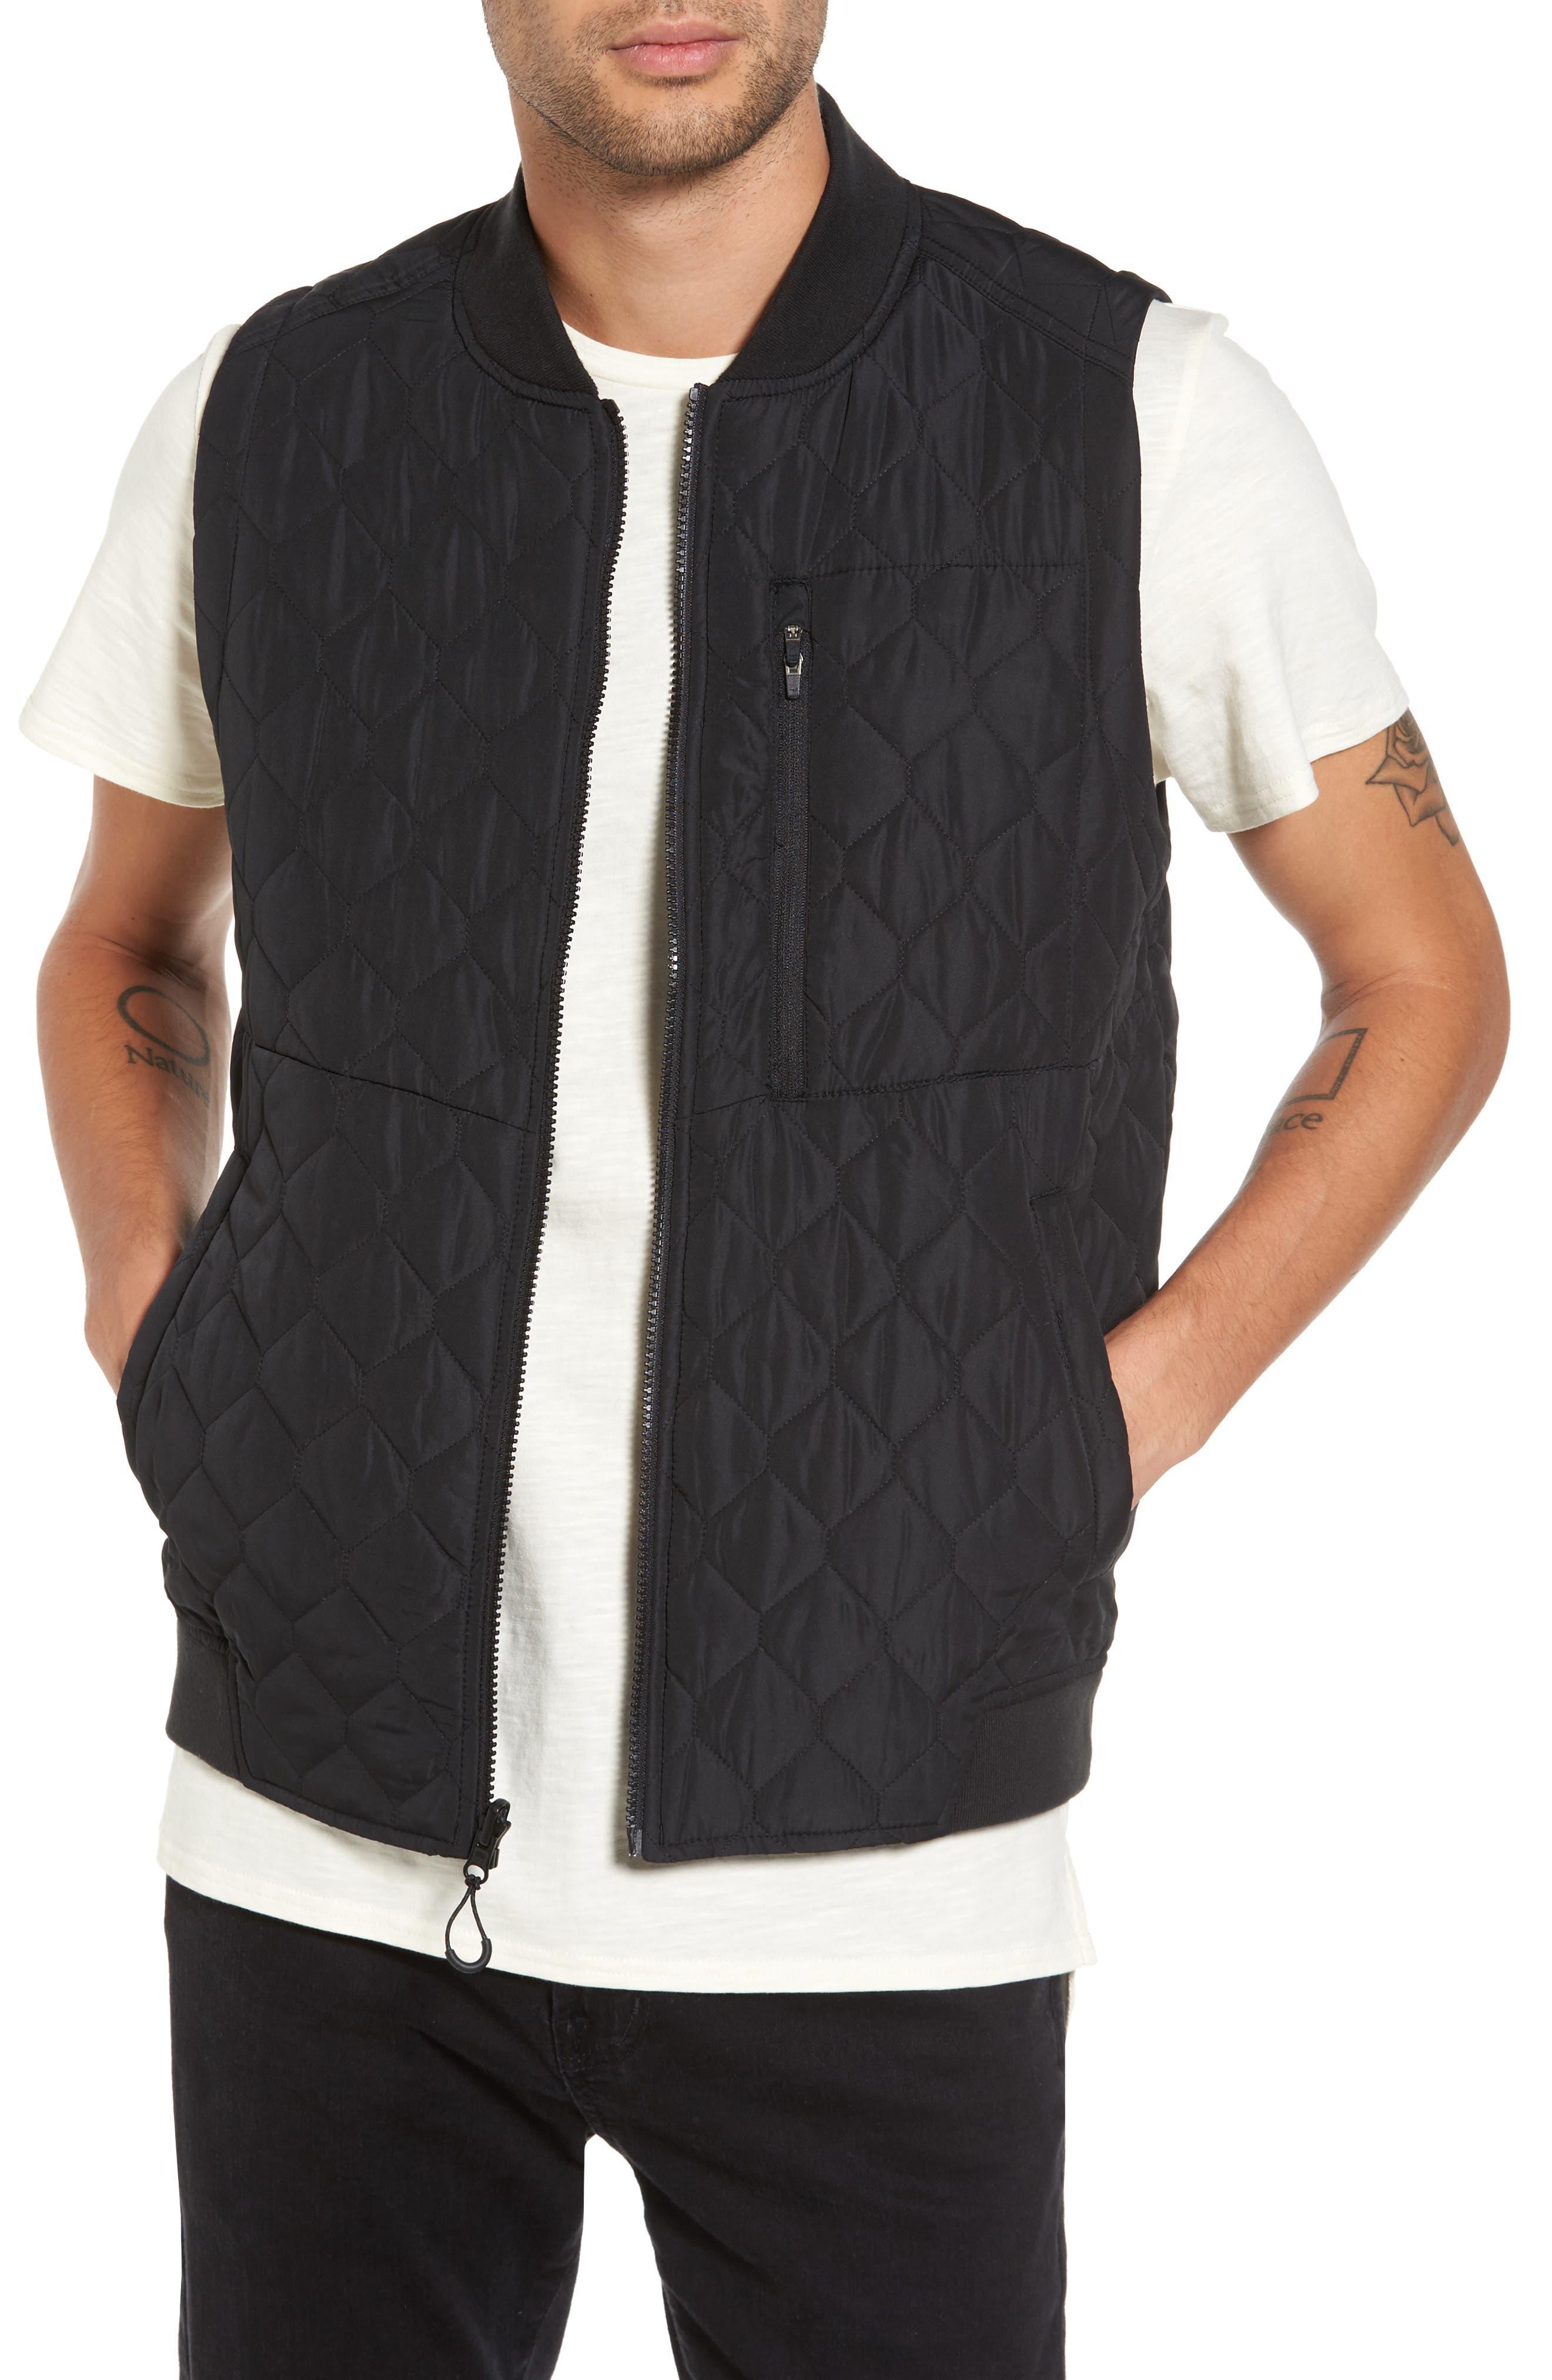 Main Image - TAVIK Replicant Quilted Vest